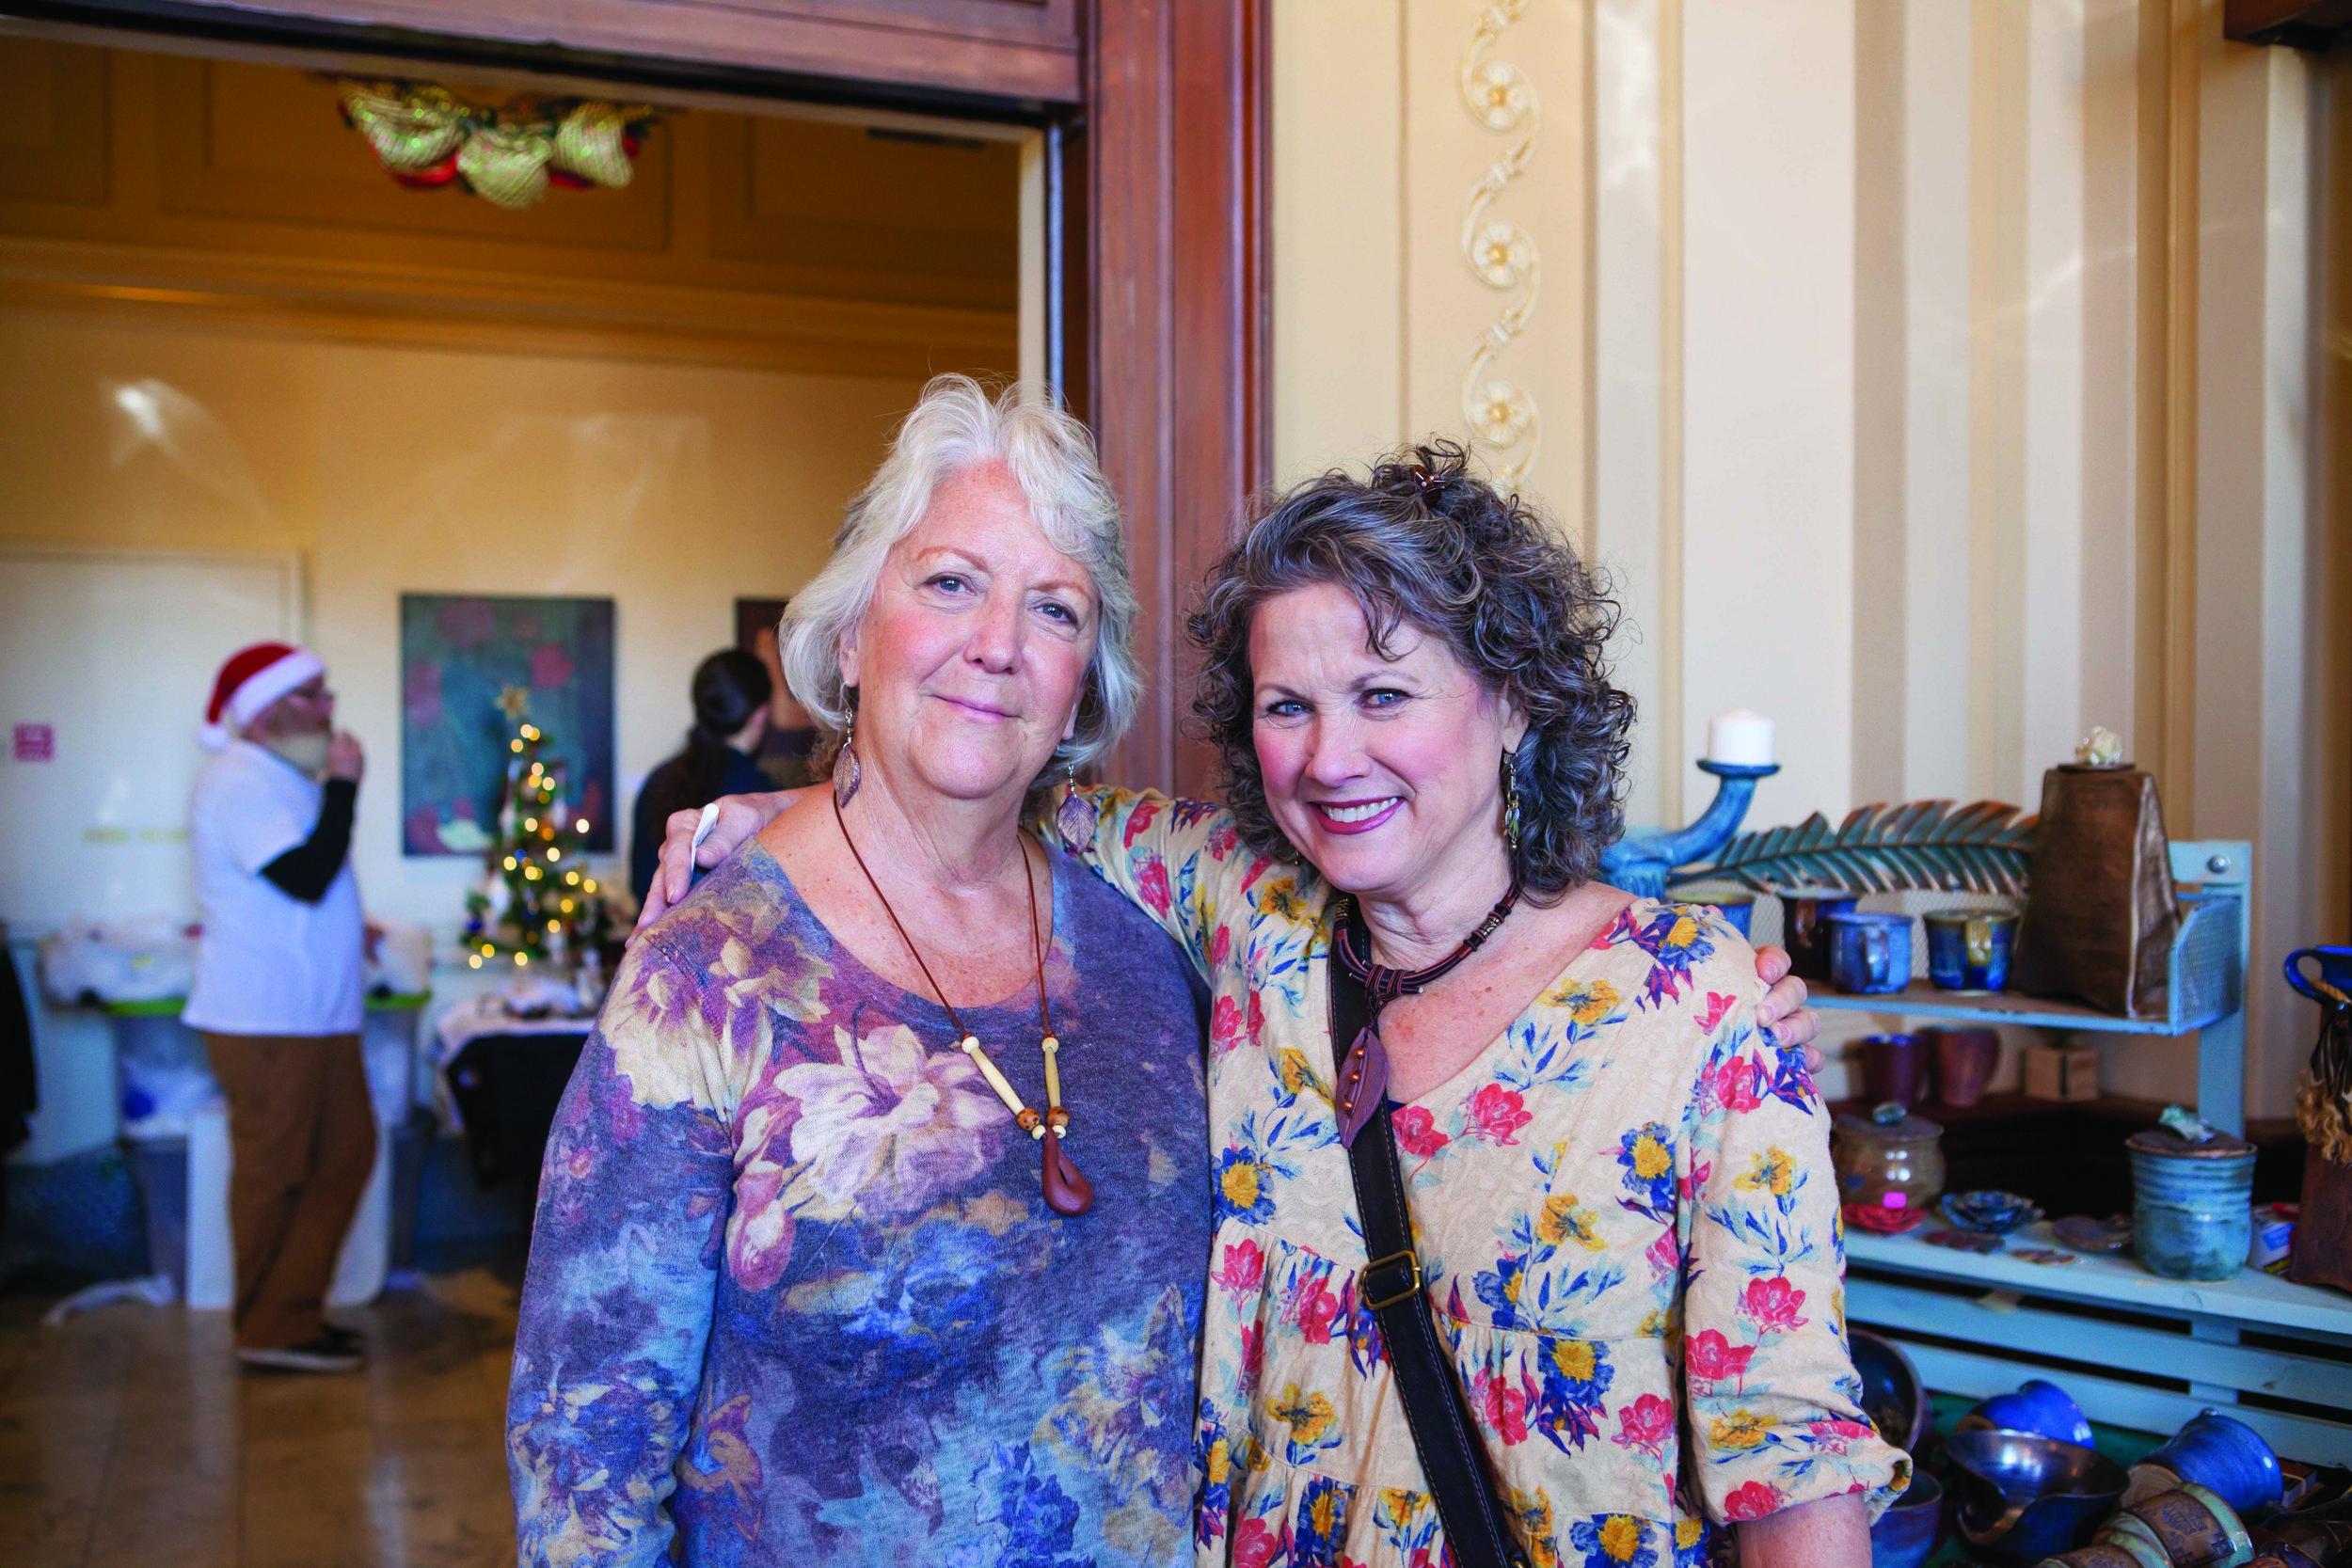 Joyce Parry and Judy Jones